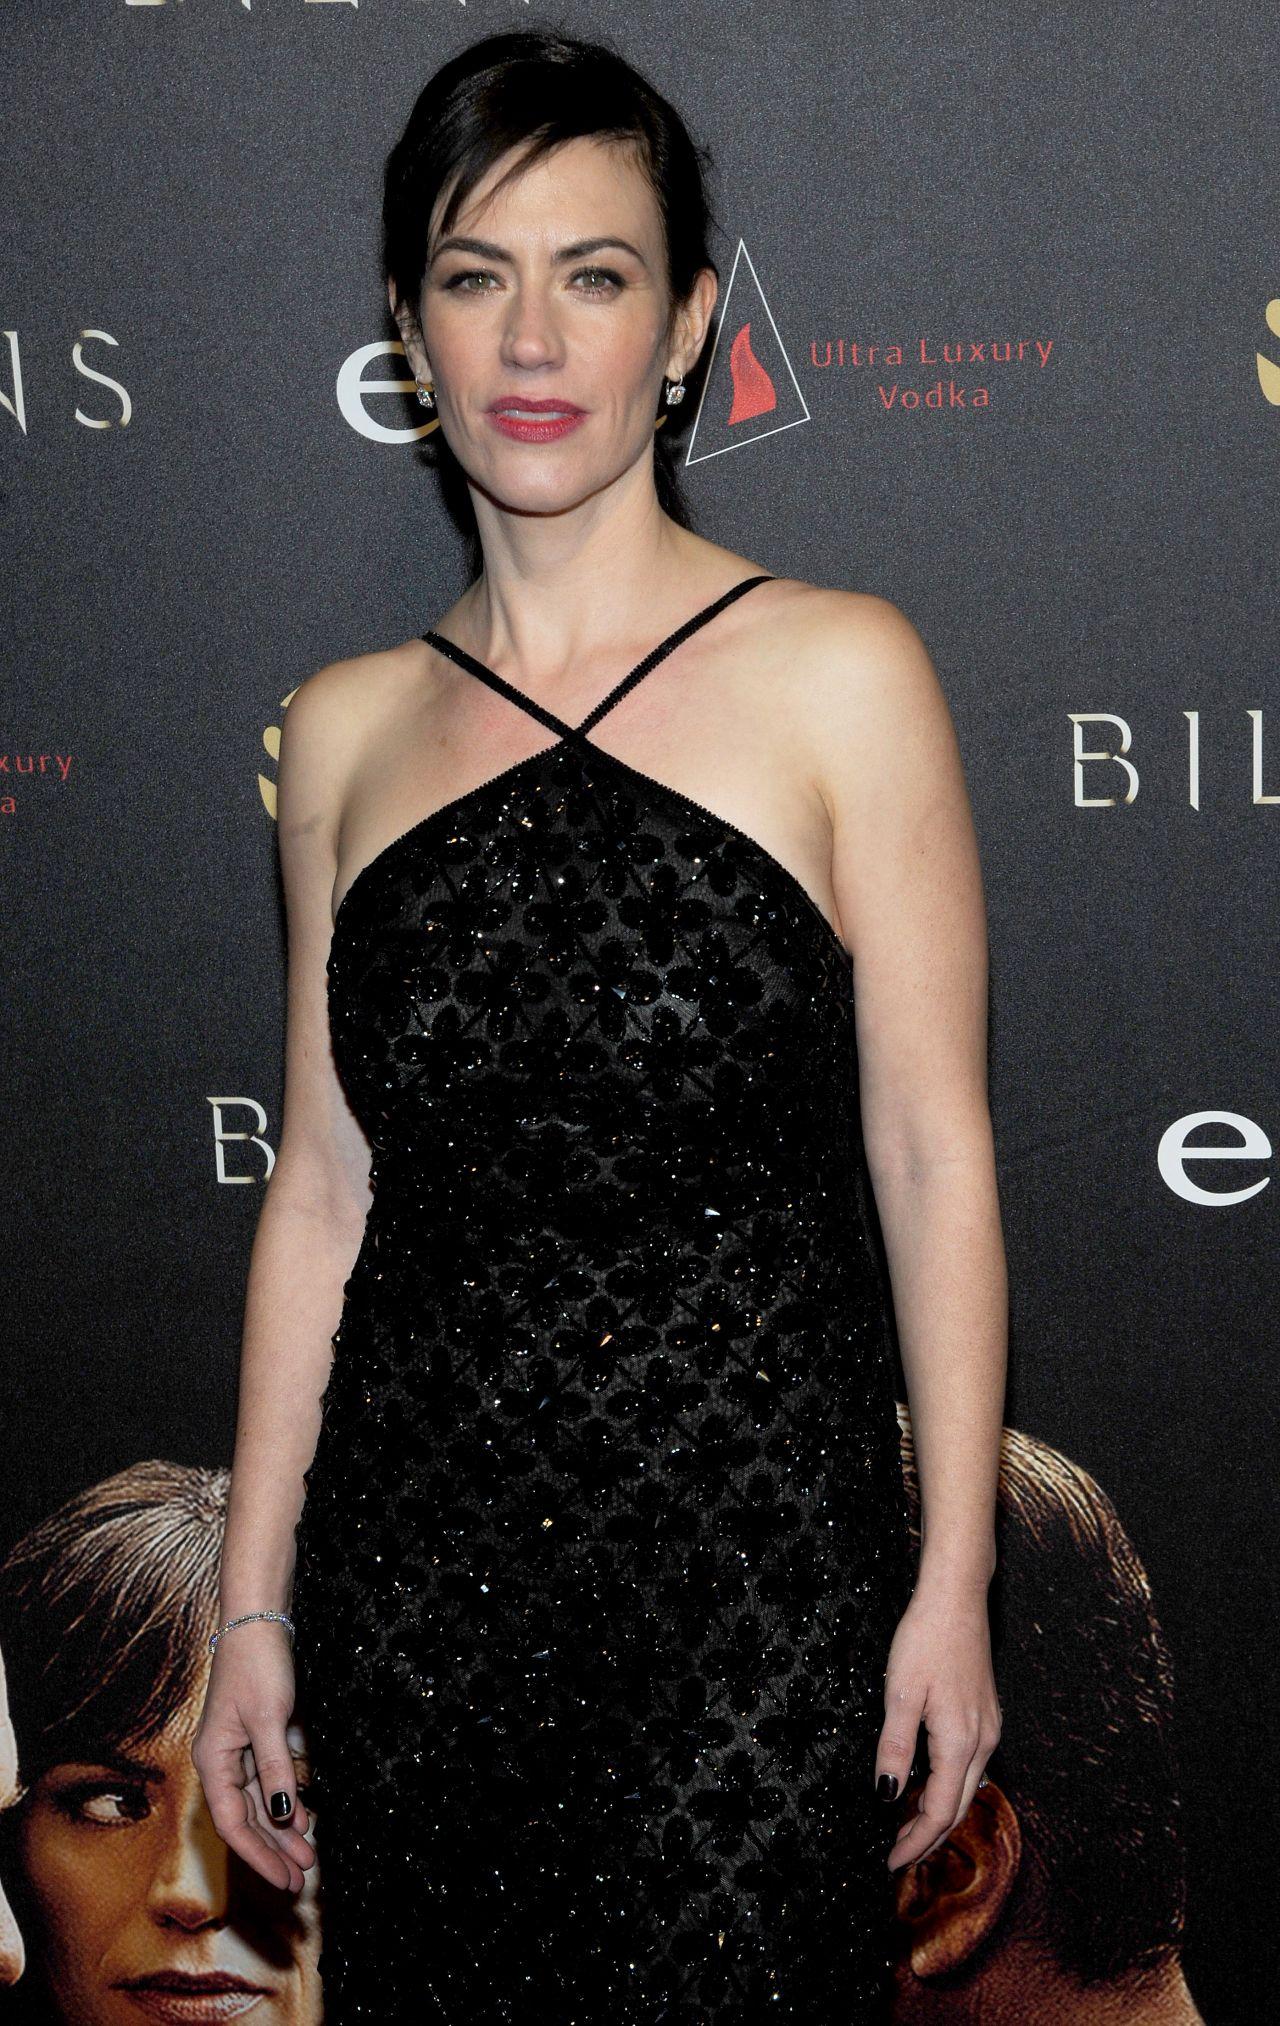 Maggie Siff At Billions Season 2 Premiere In Nyc 2 13 2017